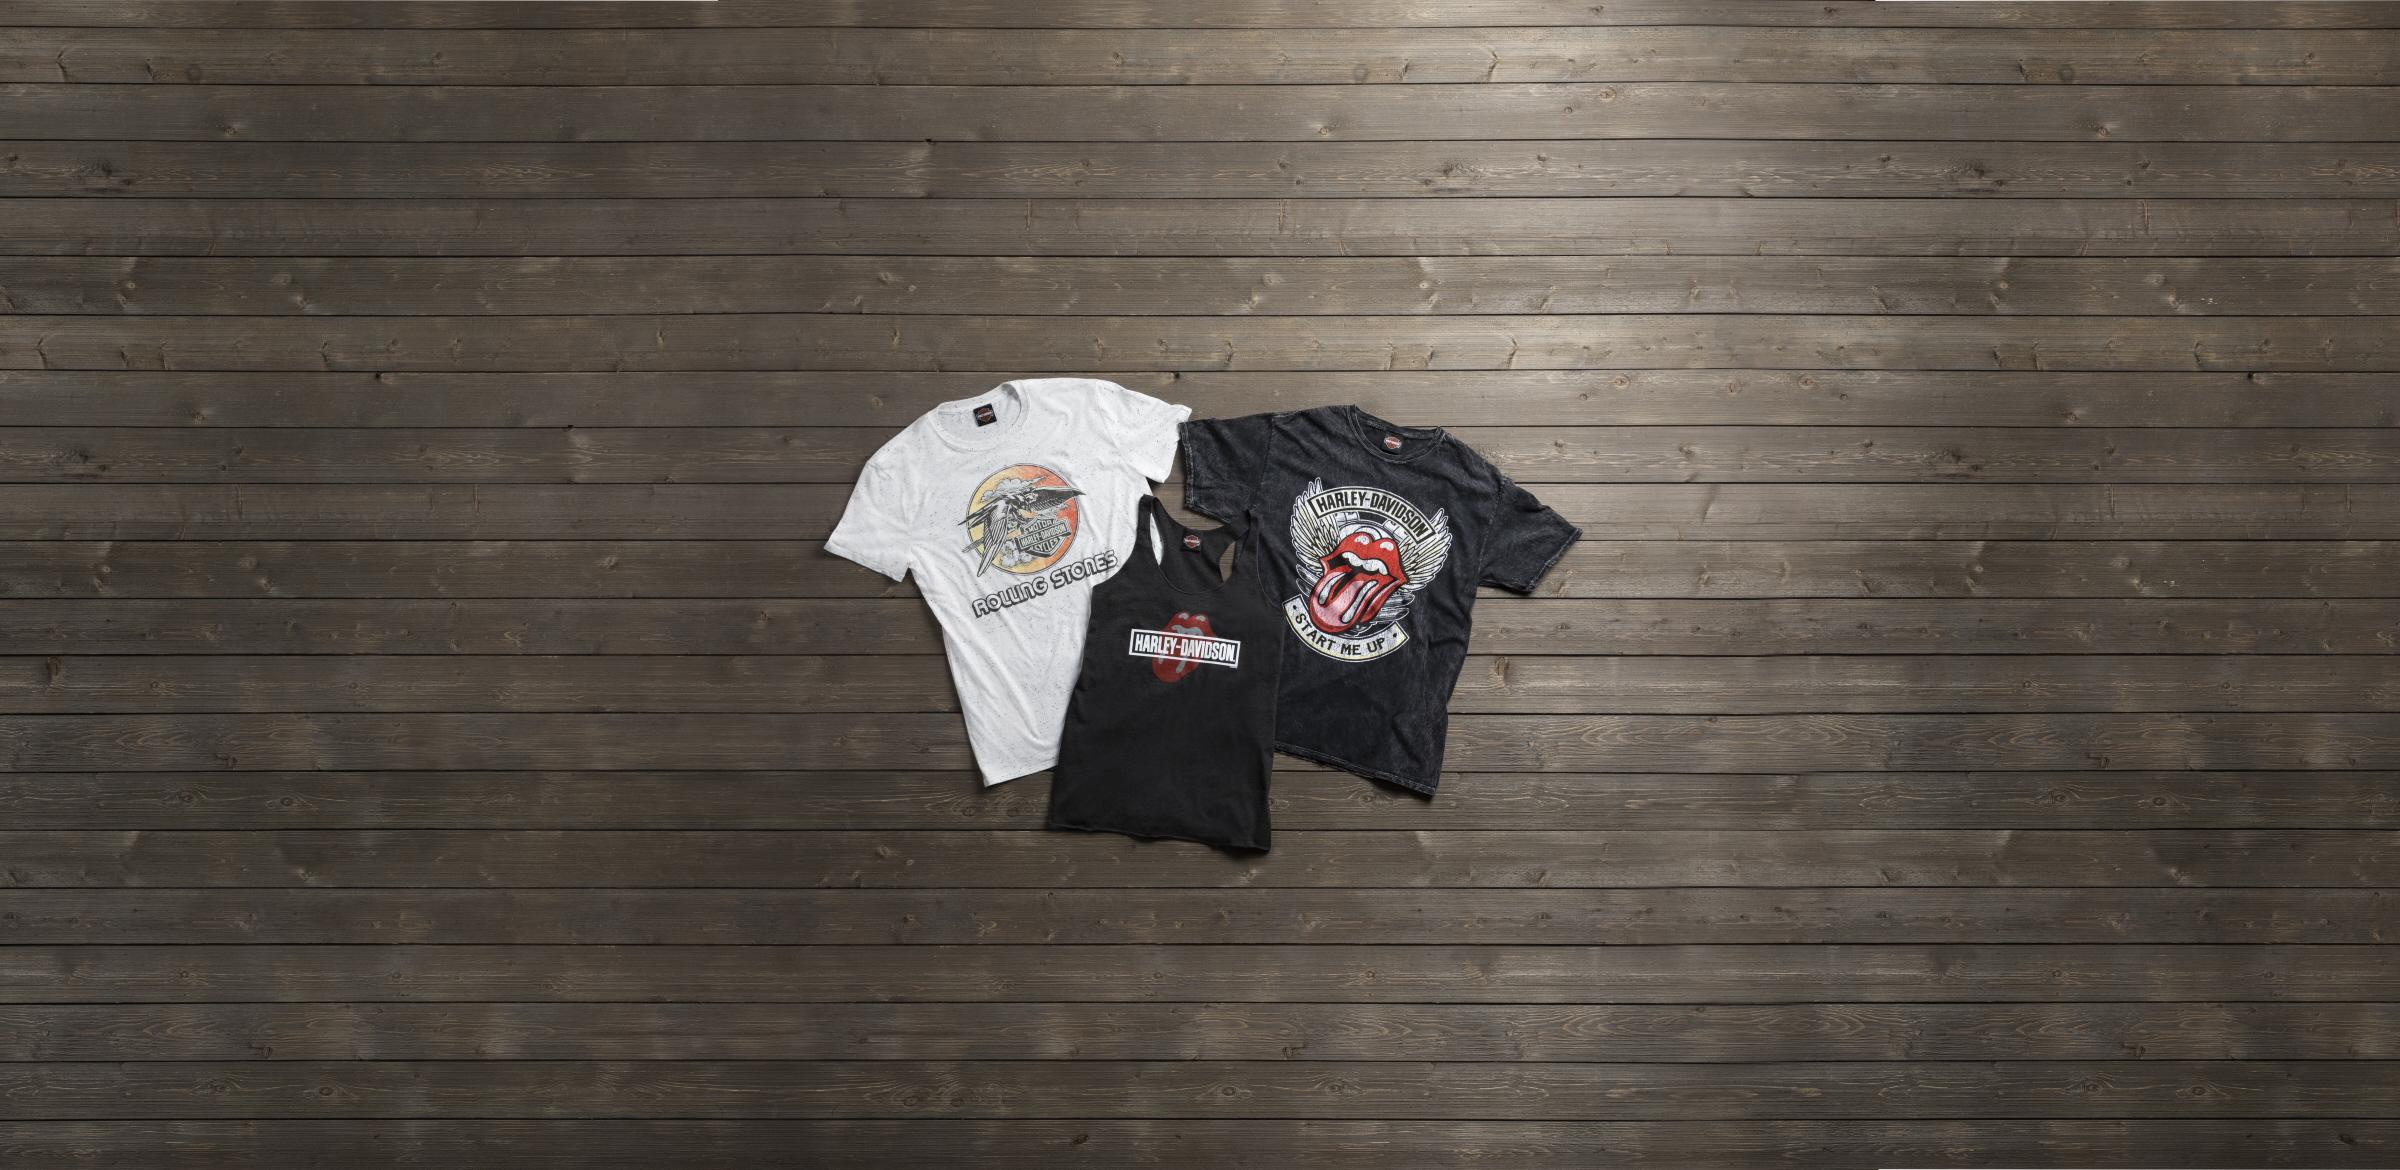 High-Res JPG - 191328_Rolling Stones T-shirt.jpg